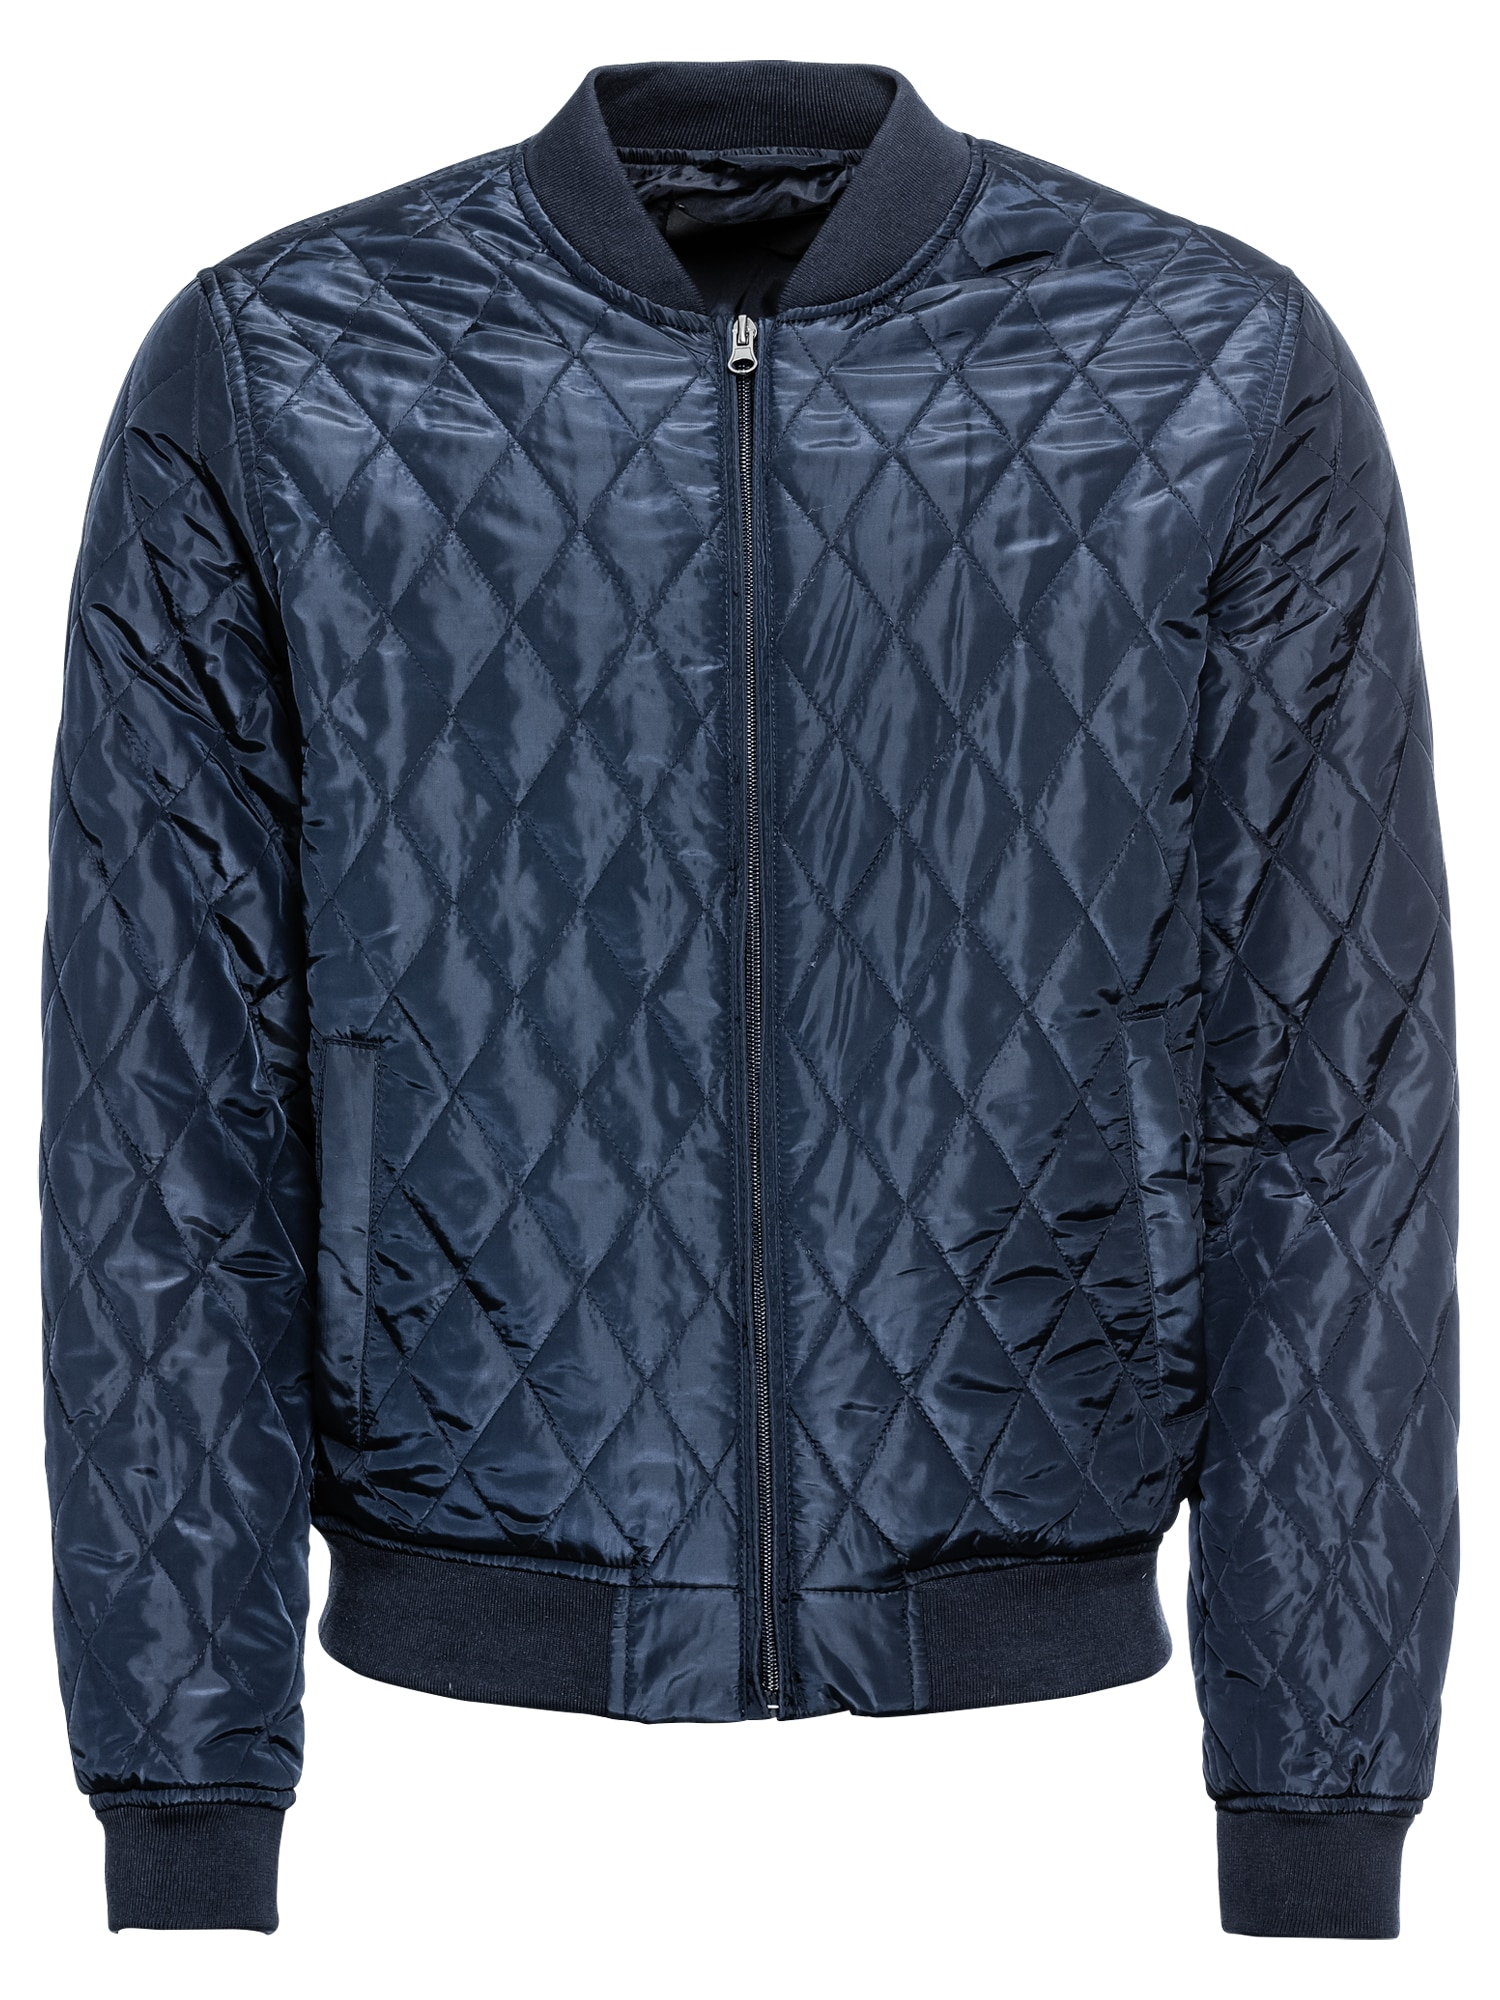 Přechodná bunda BASO QUILT VARSITY tmavě modrá KIOMI